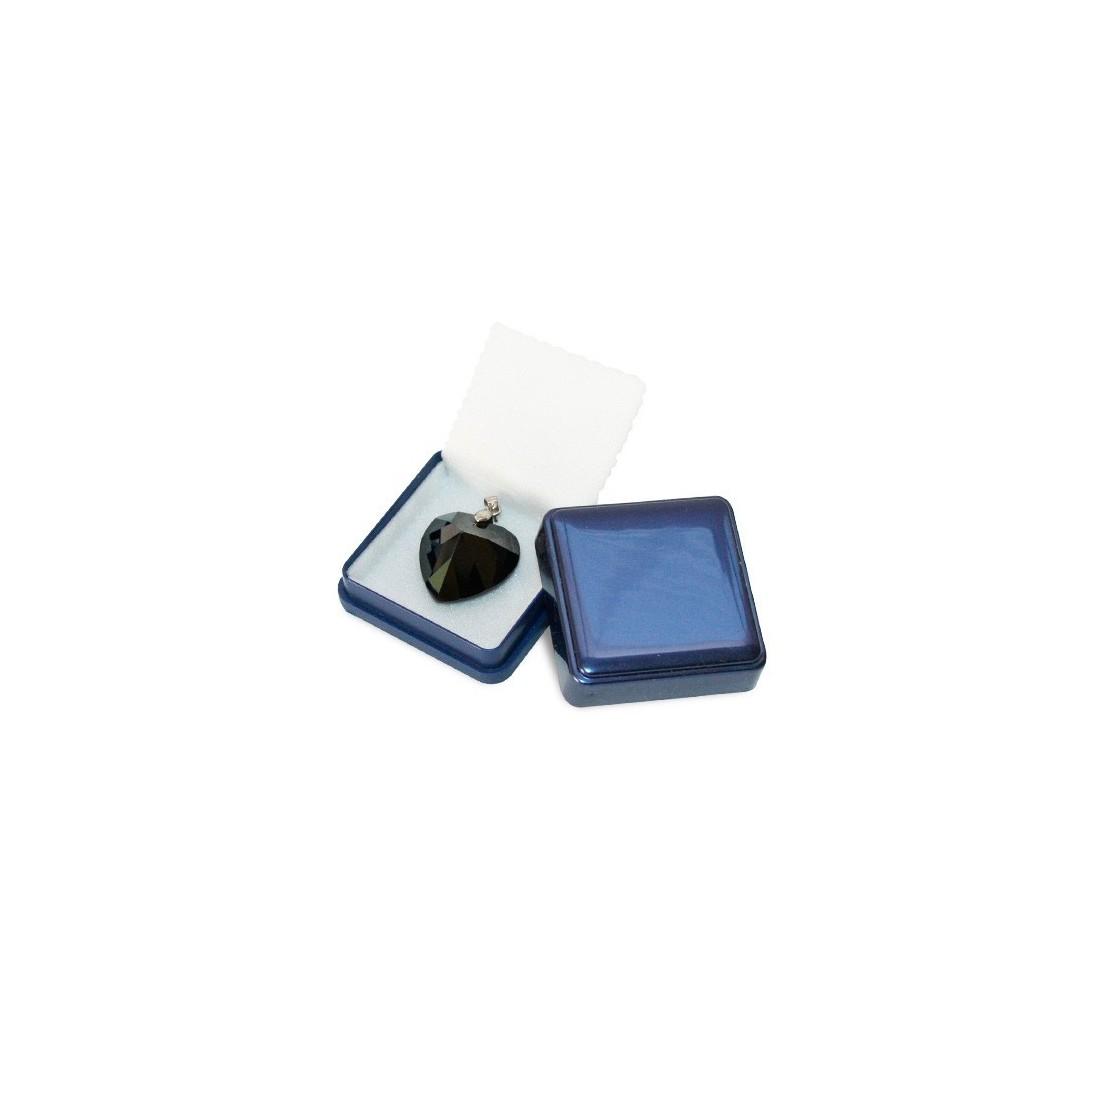 Plastic Jewellery Box, with Flaps